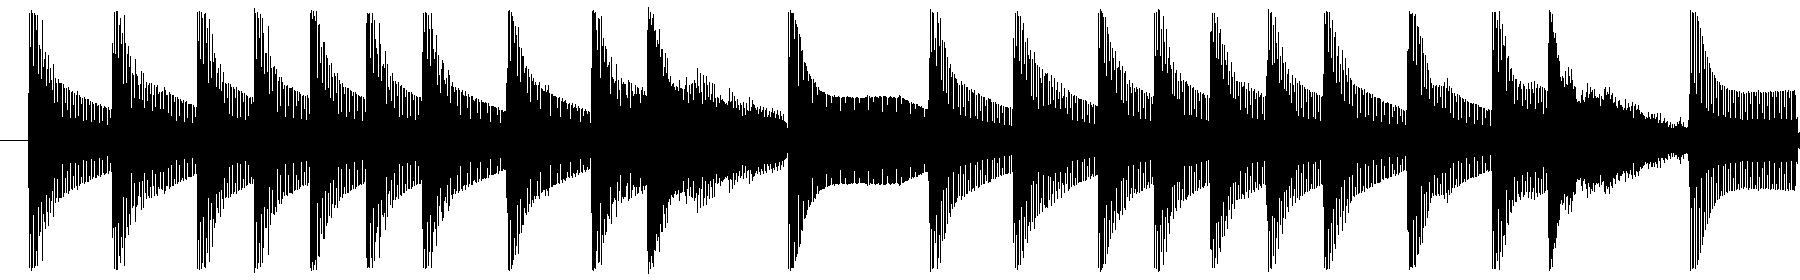 ehu basslp 125 035 gb